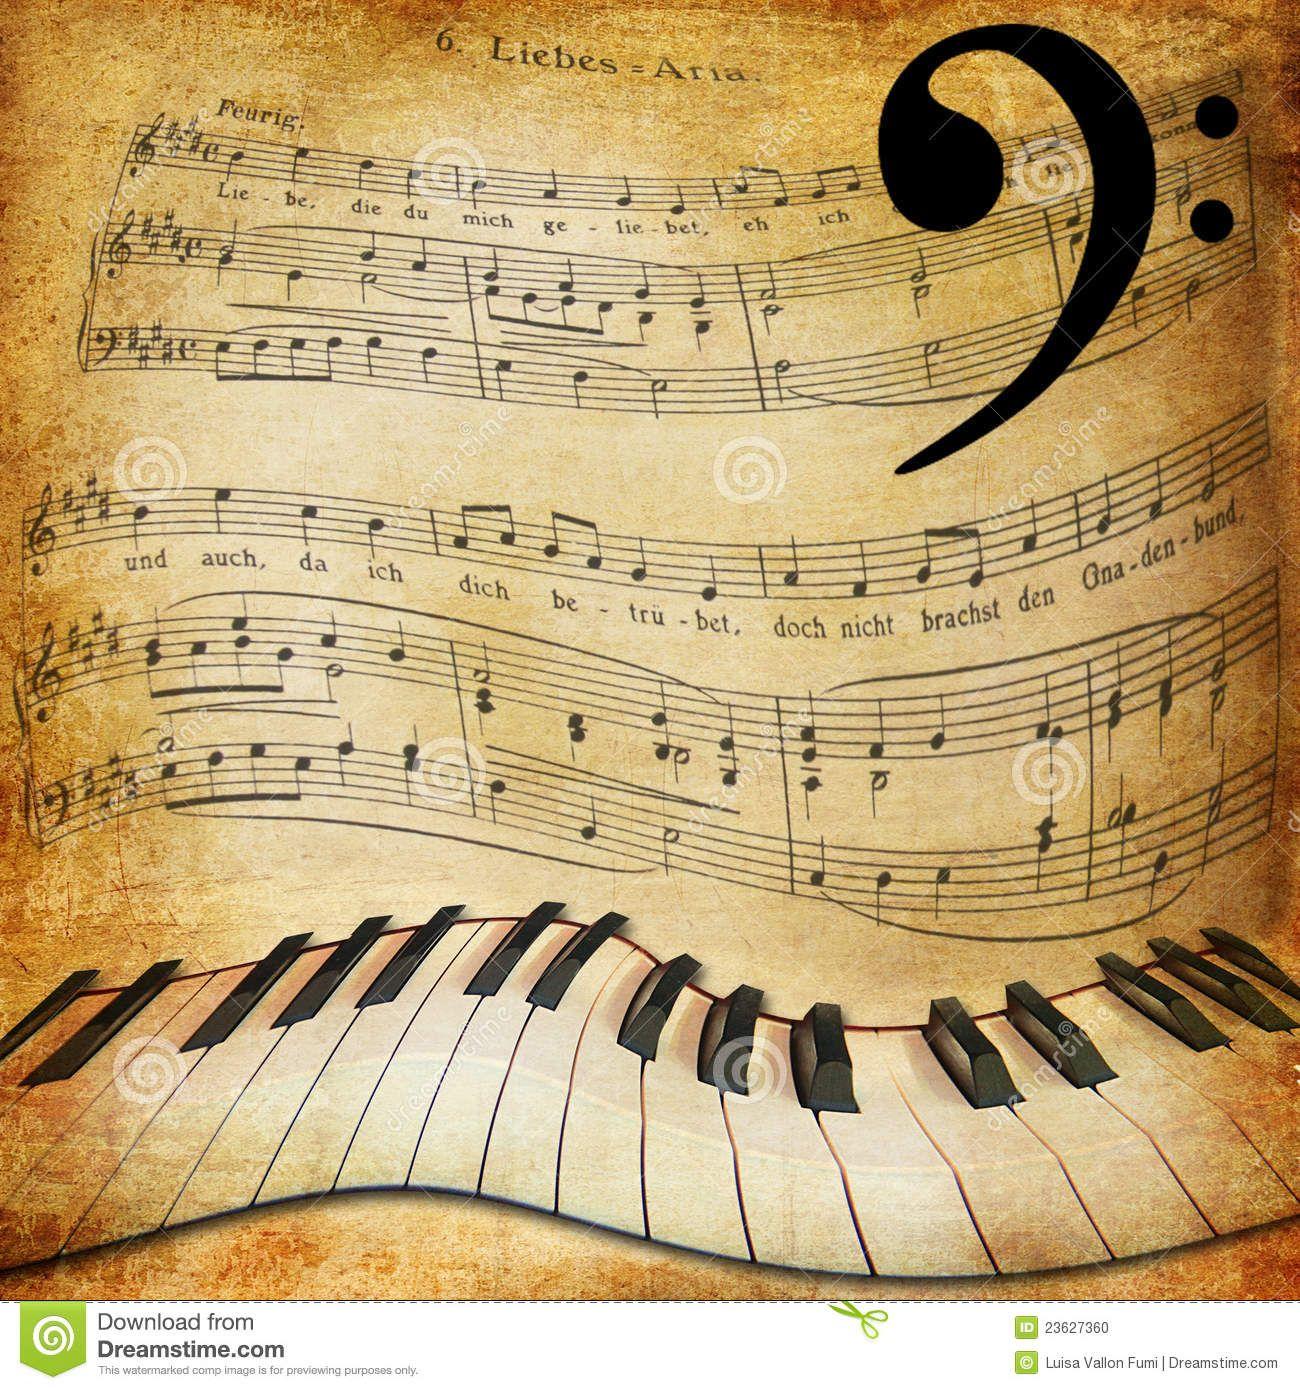 music exam artwork - Google Search   MUSIC   Pinterest